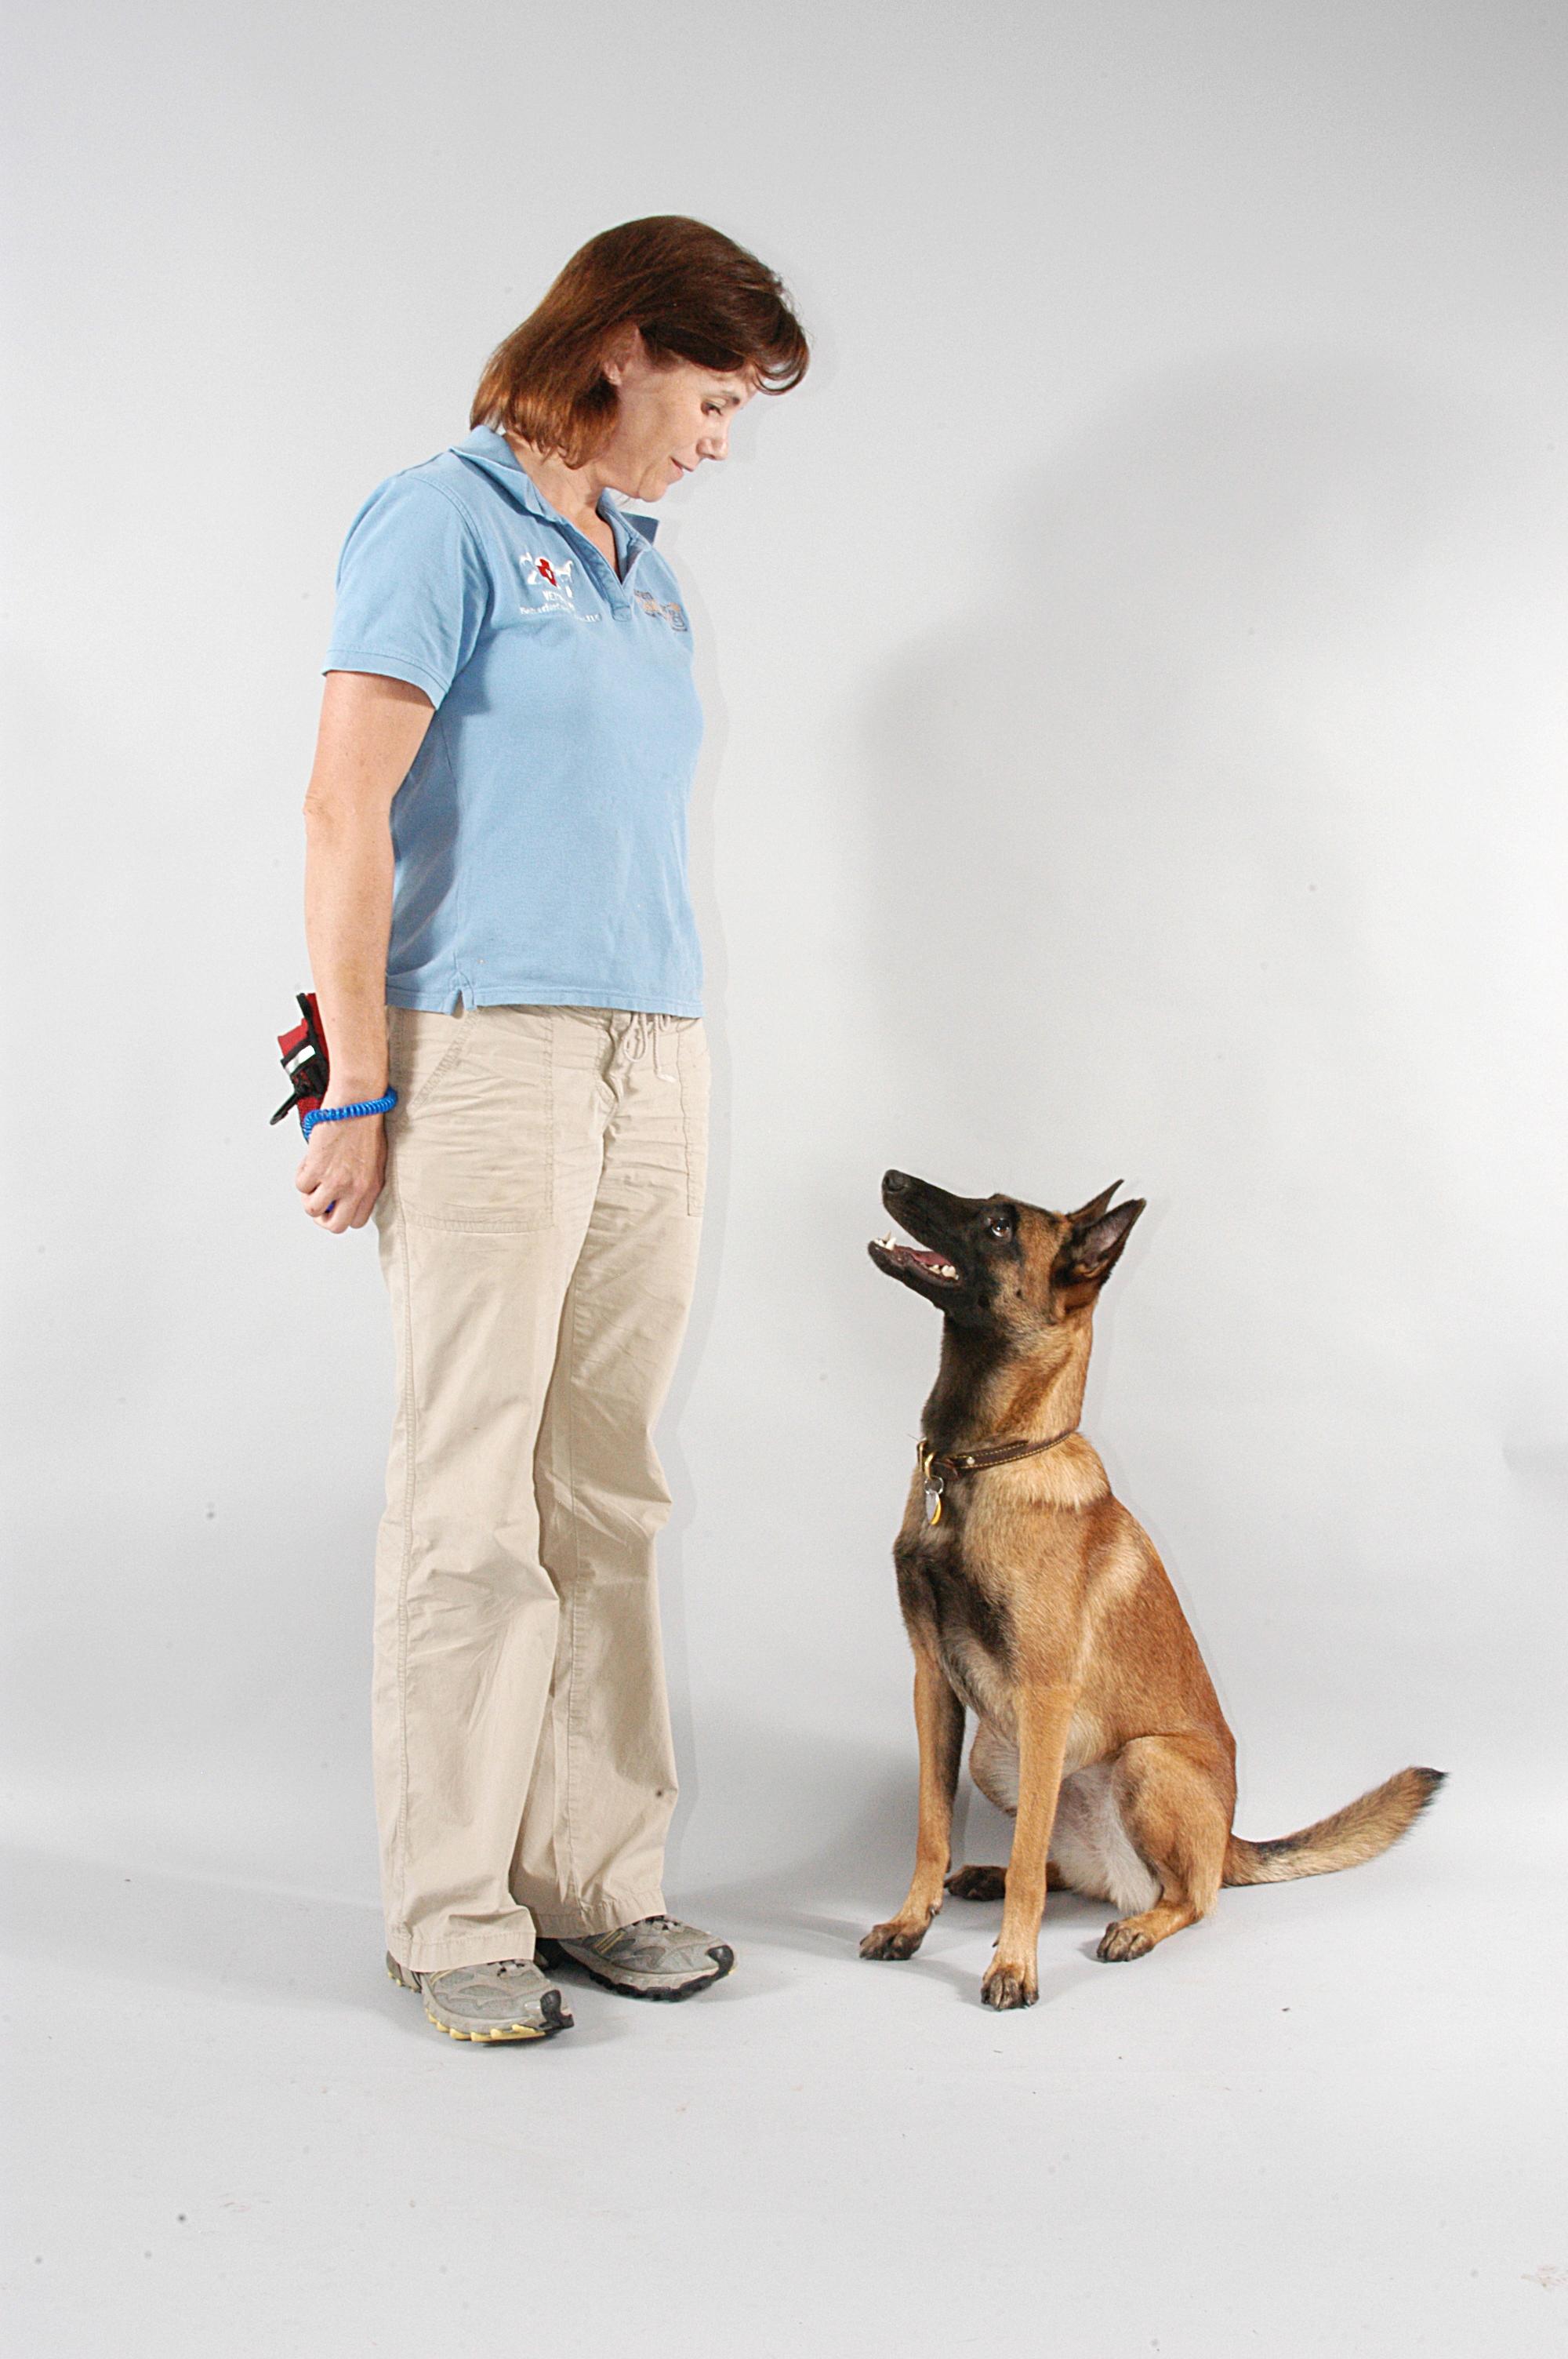 Best dog trainer seminars and webinars for dog aggression, dog training, leash reactivity, separation anxiety, fear free, vet handling.